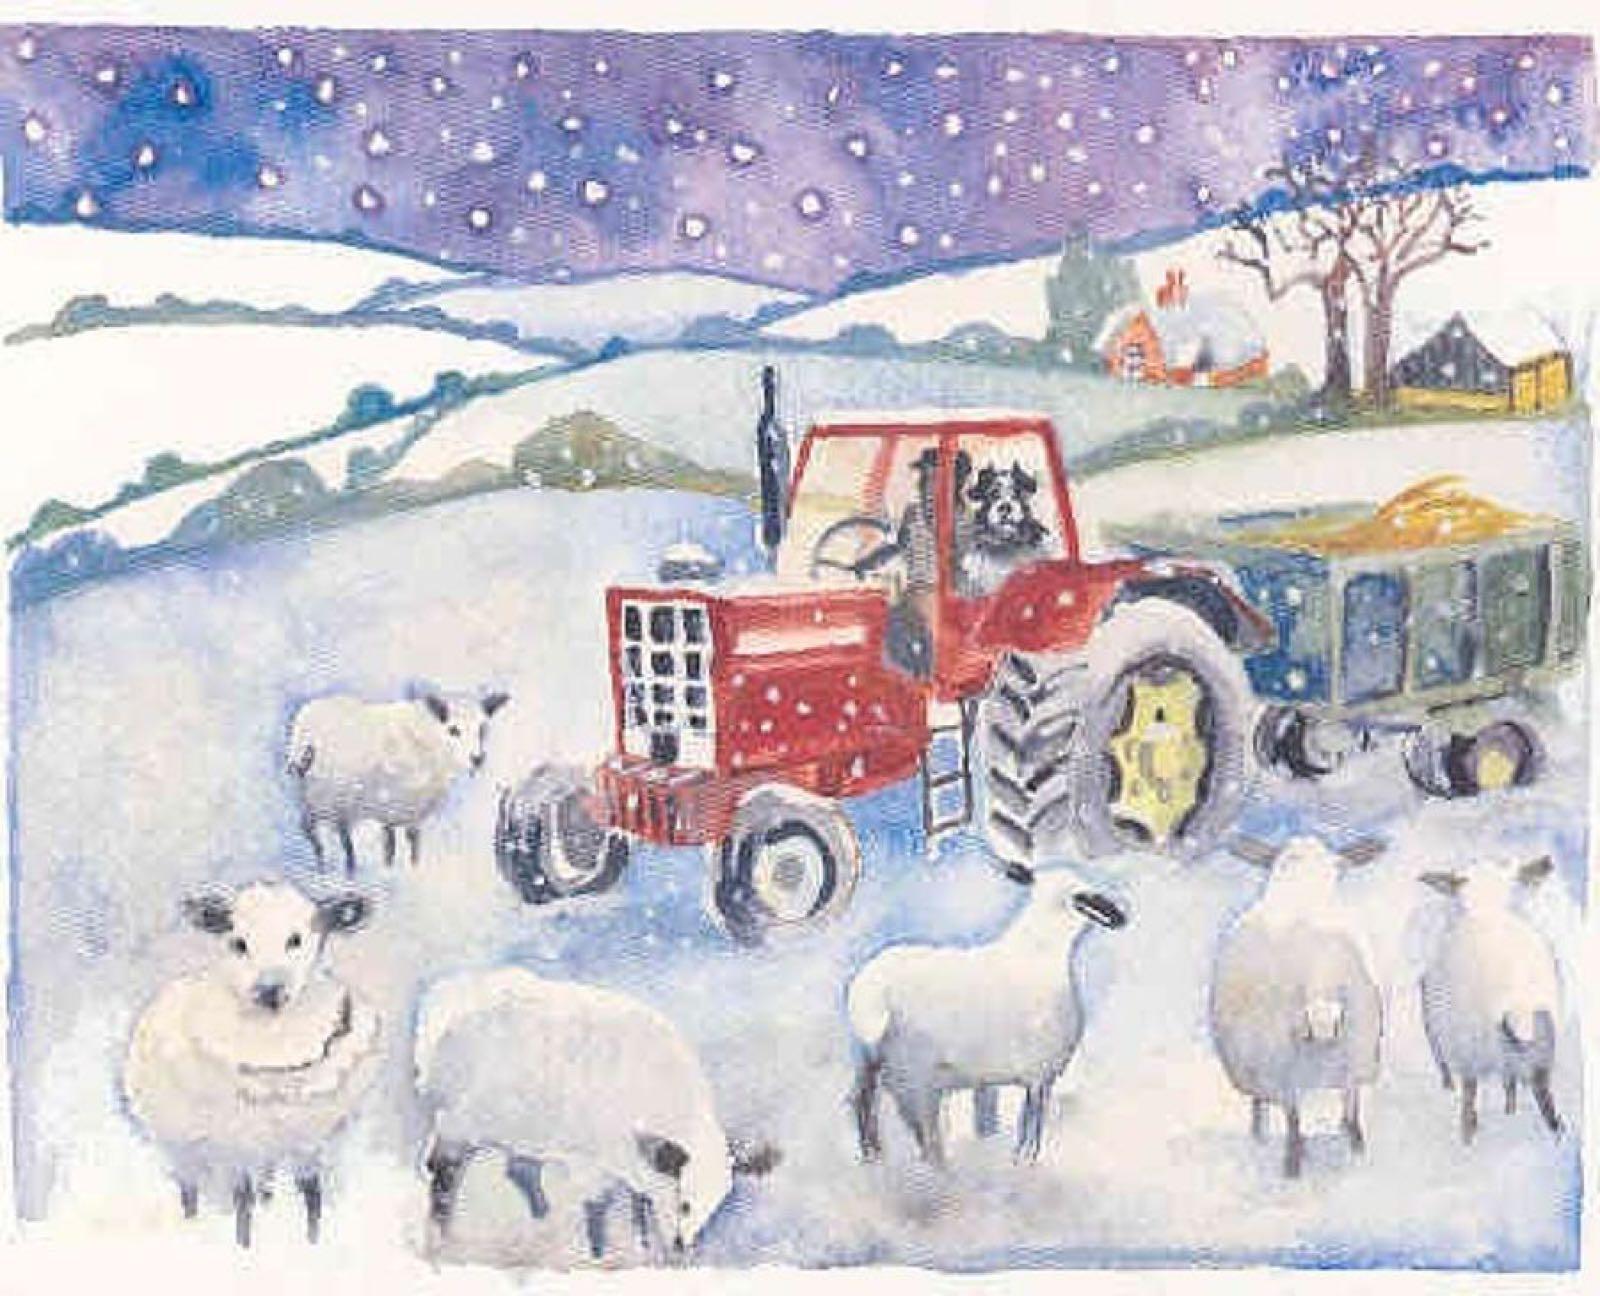 'Feeding the Sheep in the Snow' Furzedown Gallery Mini Card